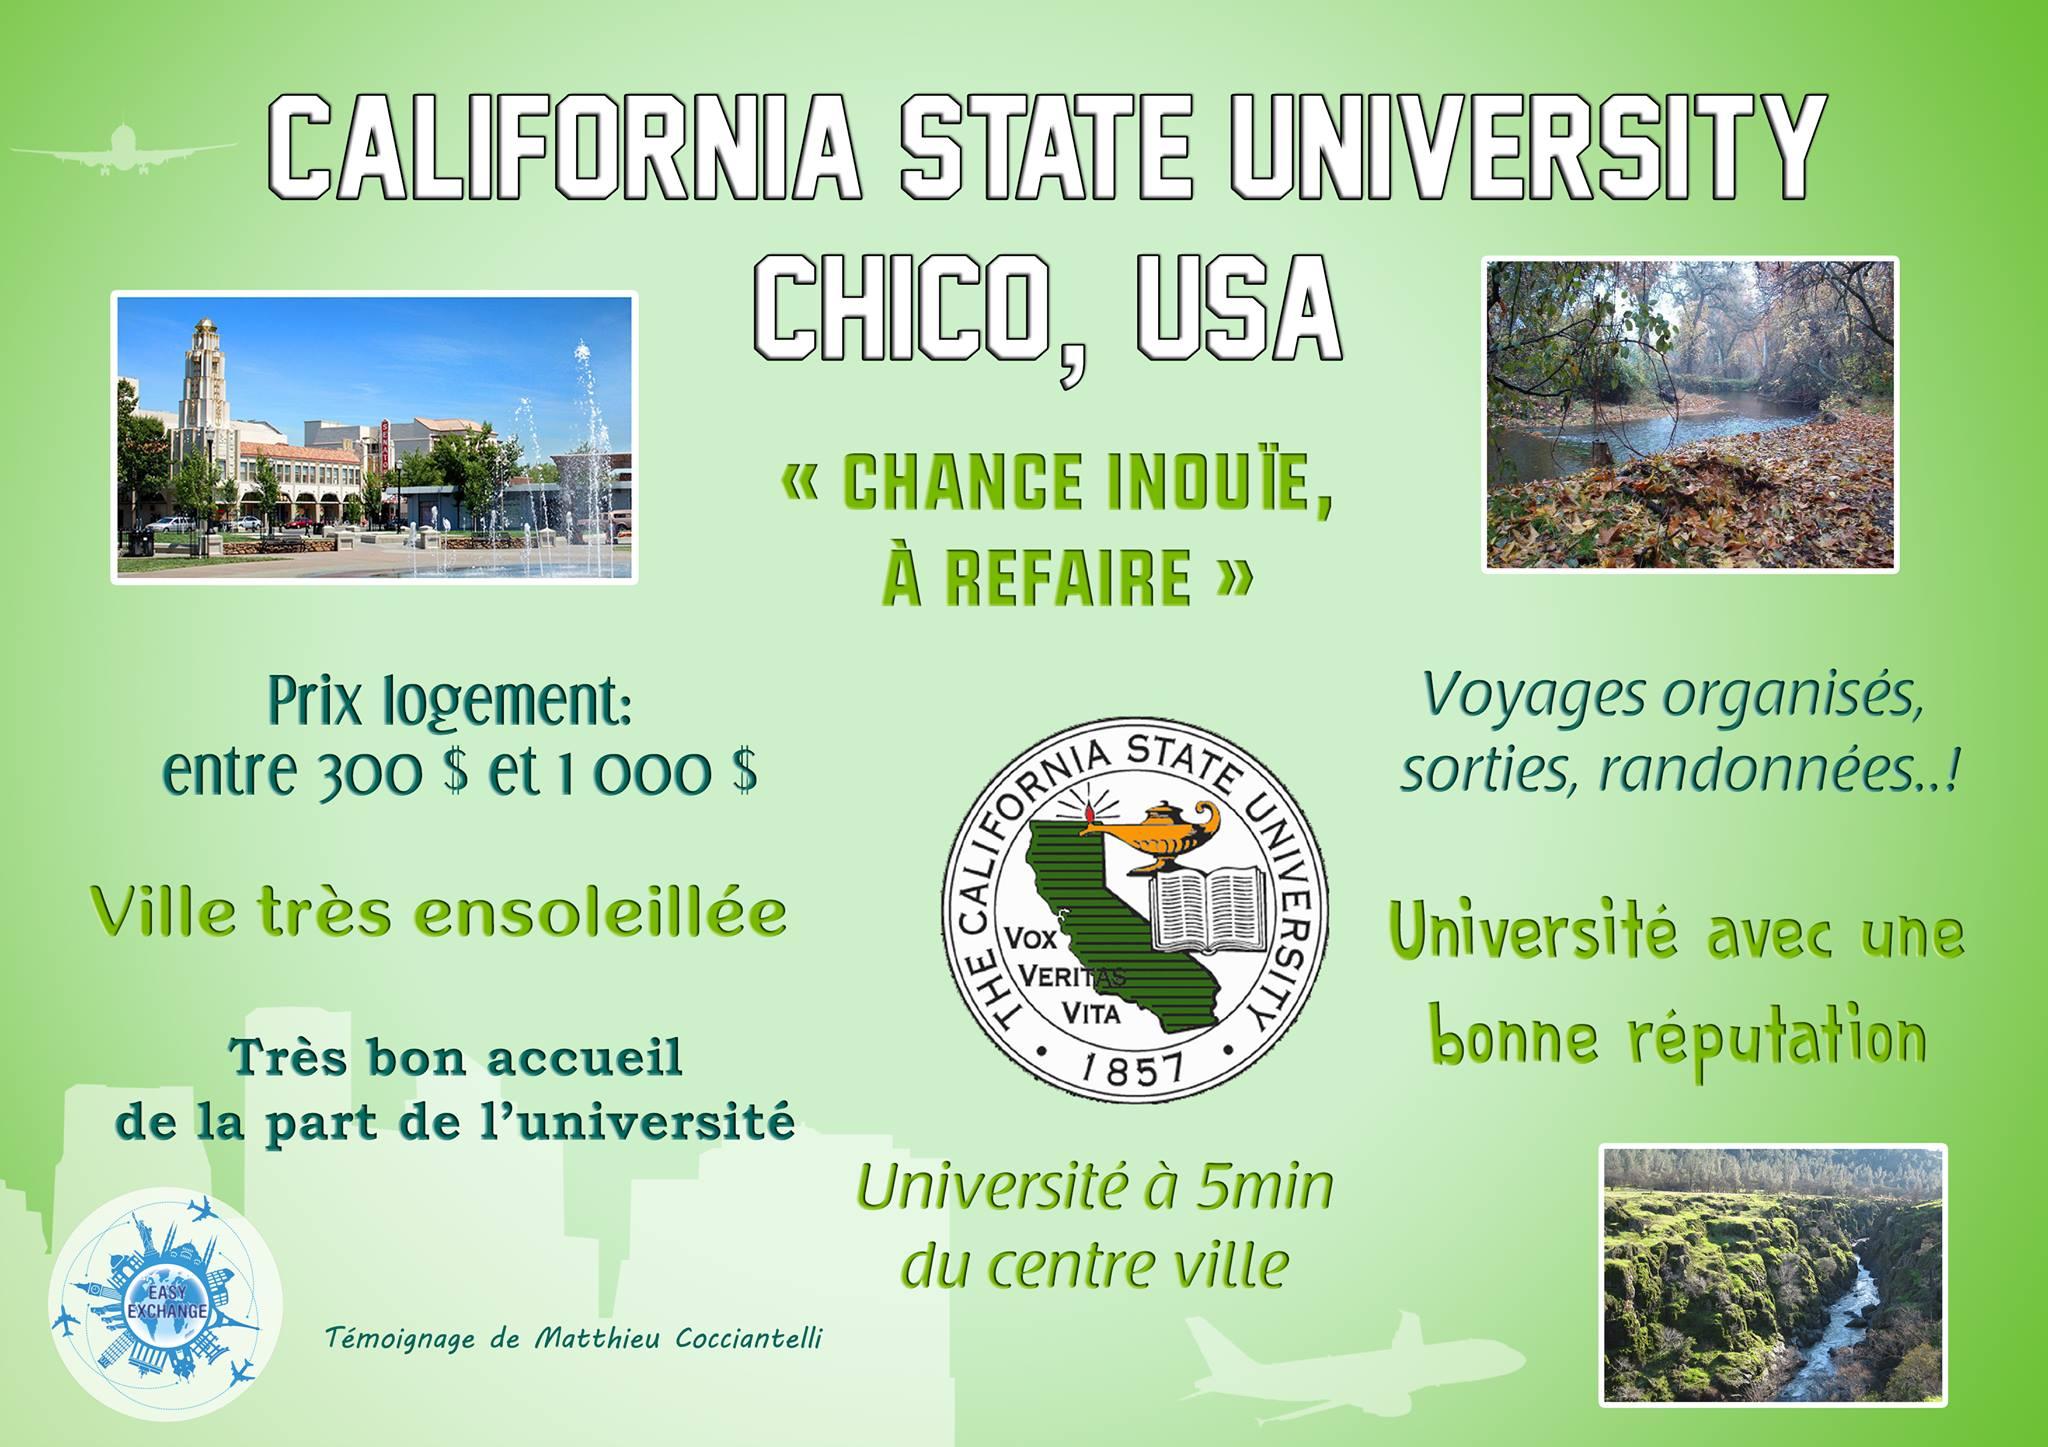 California State Univeristy Chico